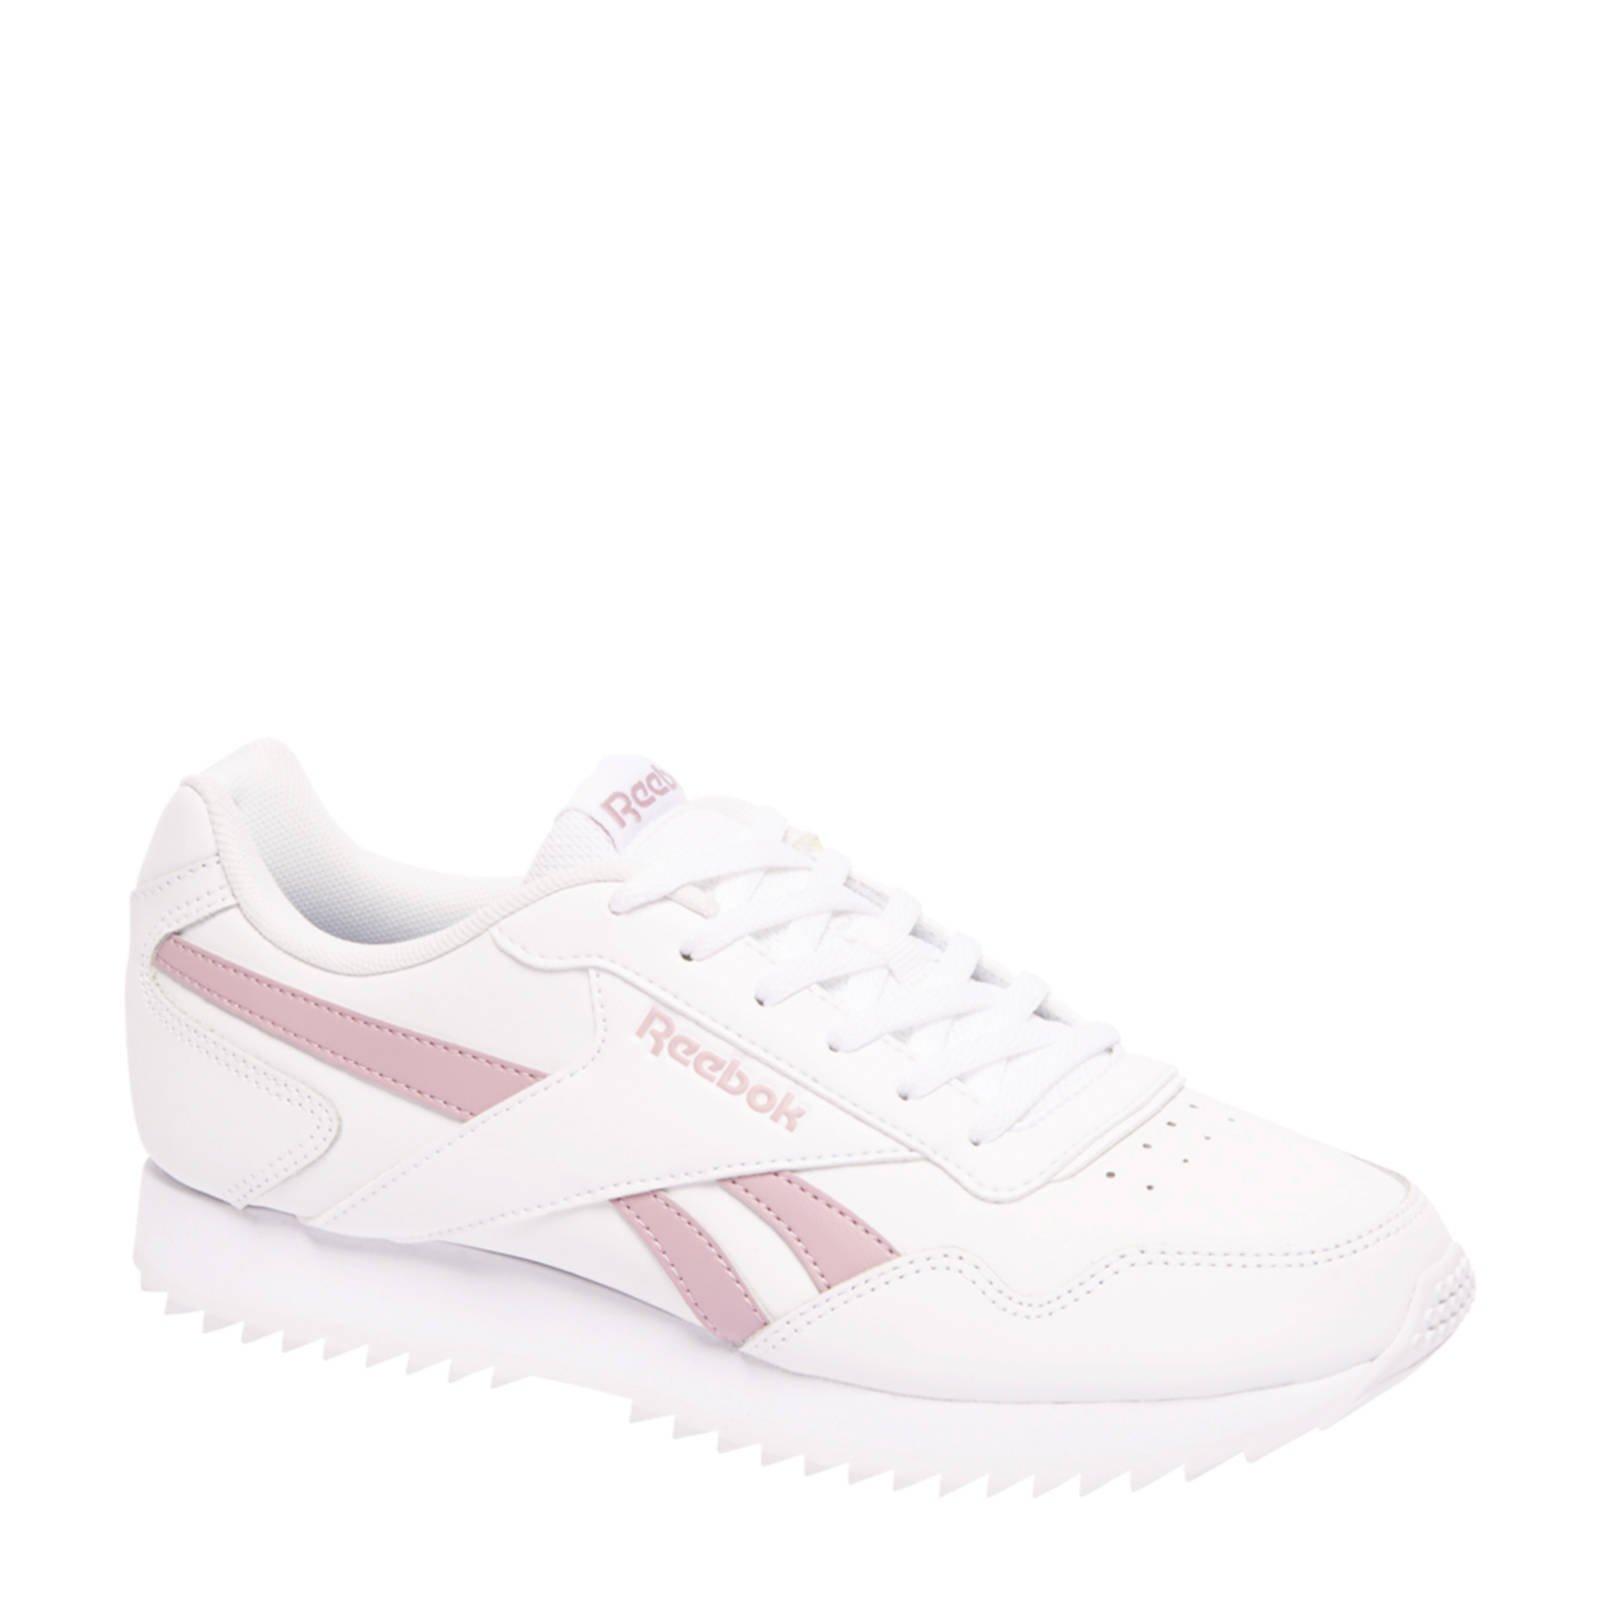 0e4cbf8d22f Reebok Royal Glide syède sneakers wit   wehkamp